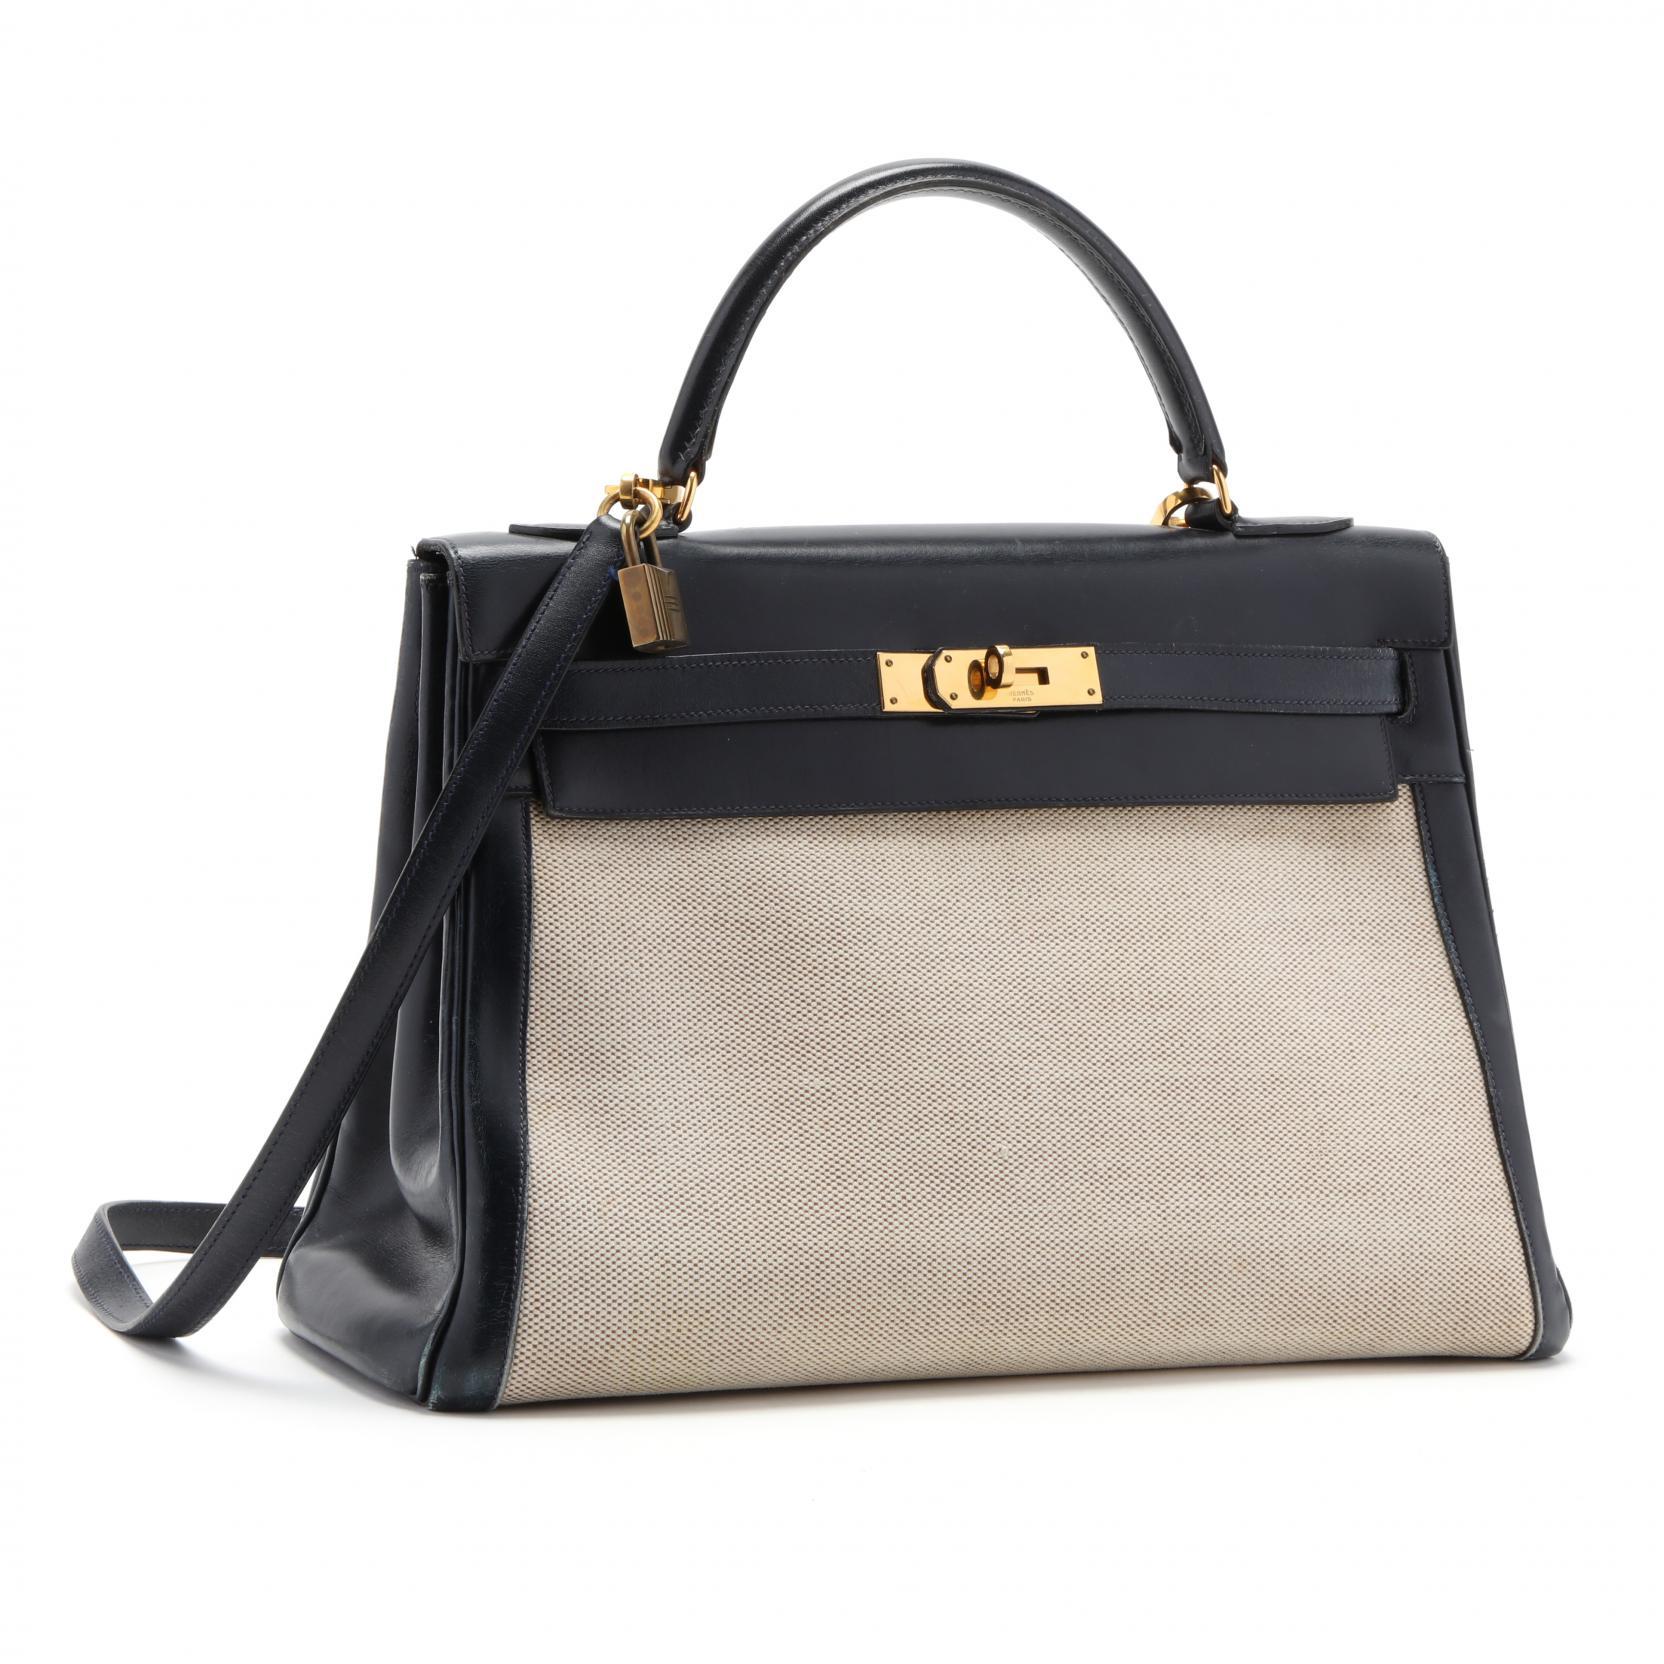 toile-and-indigo-kelly-bag-32-hermes